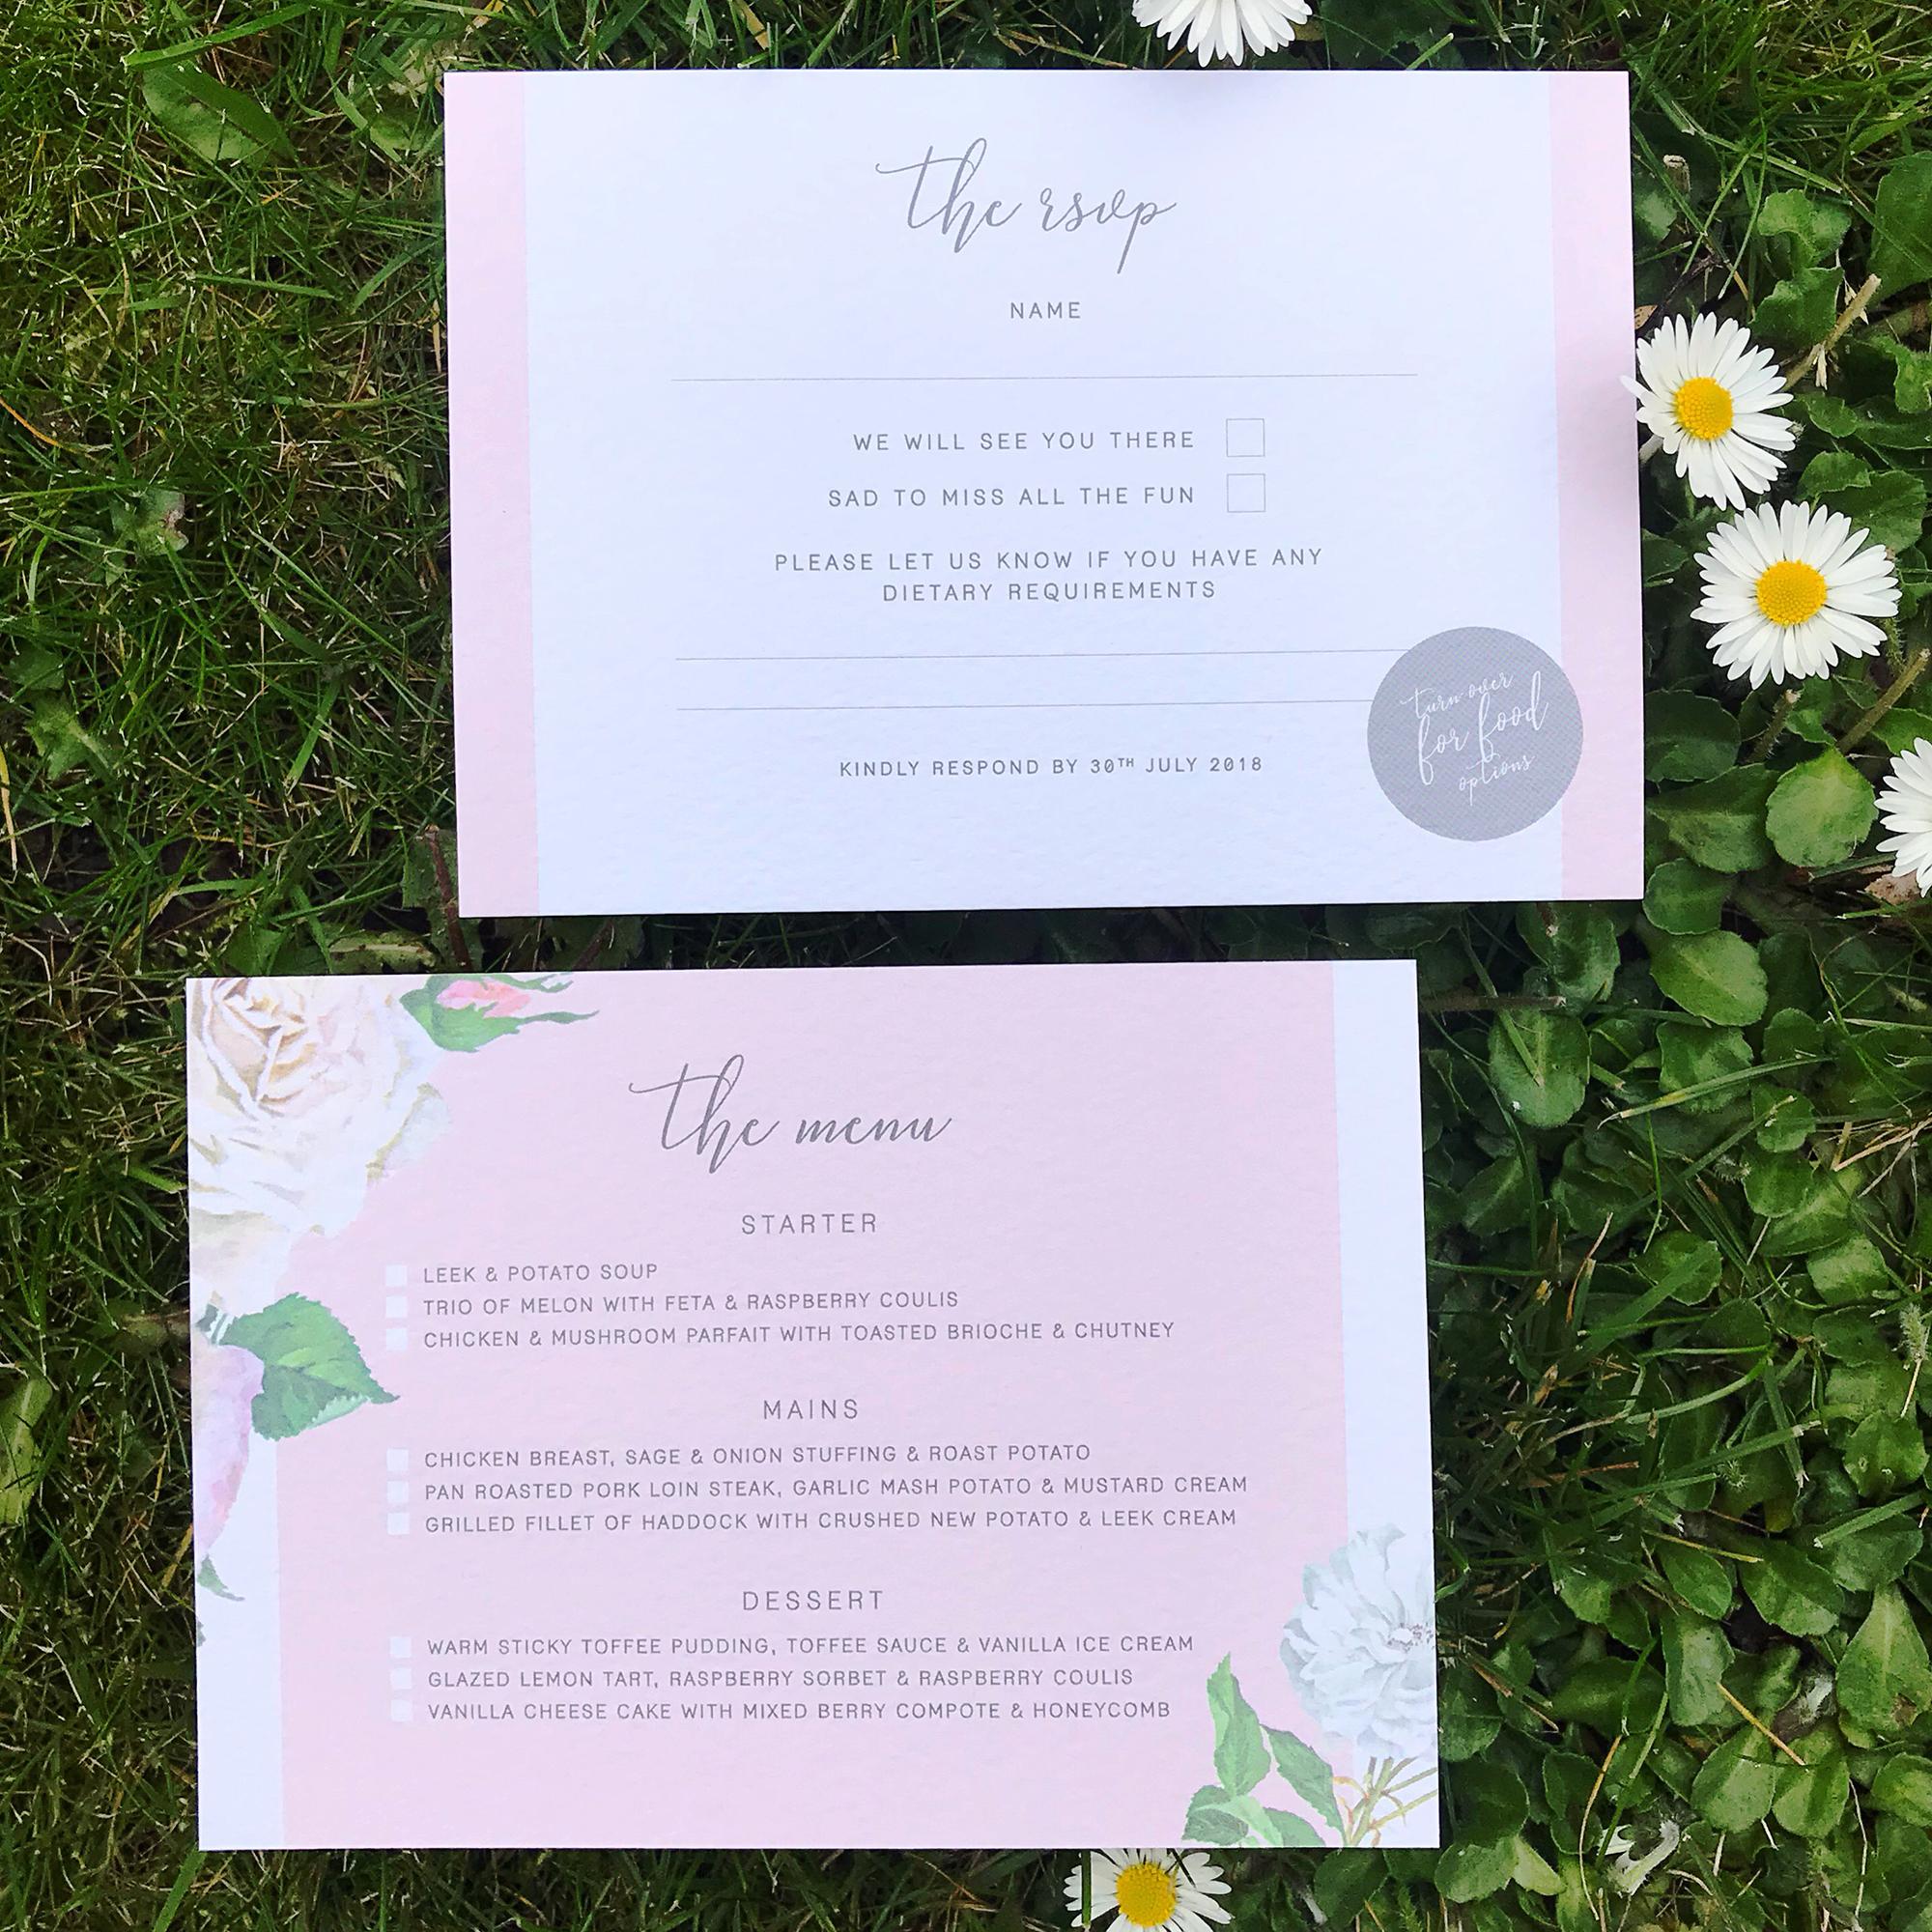 Pastel-pink-wedding-invite-white-roses-cheltenham-theinkcloset-rsvp.jpg